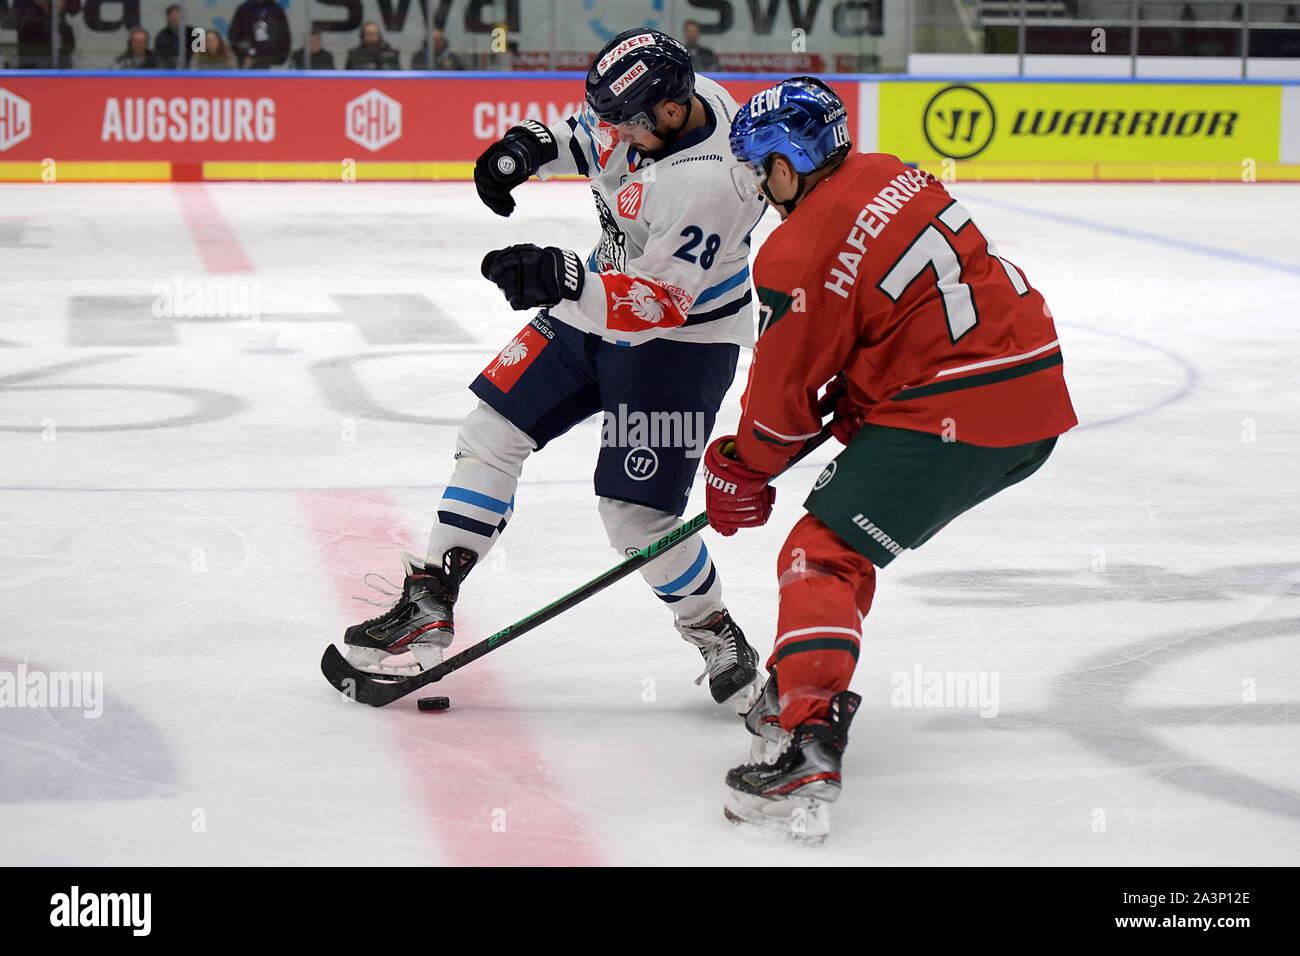 08.10.2019, xemx, Eishockey Champions Hockey League, Augsburger Panther - Bili Tygri Liberec emspor, v.l. Rostislav Marosz (Bili Tygri Liberec # 28) u Stockfoto